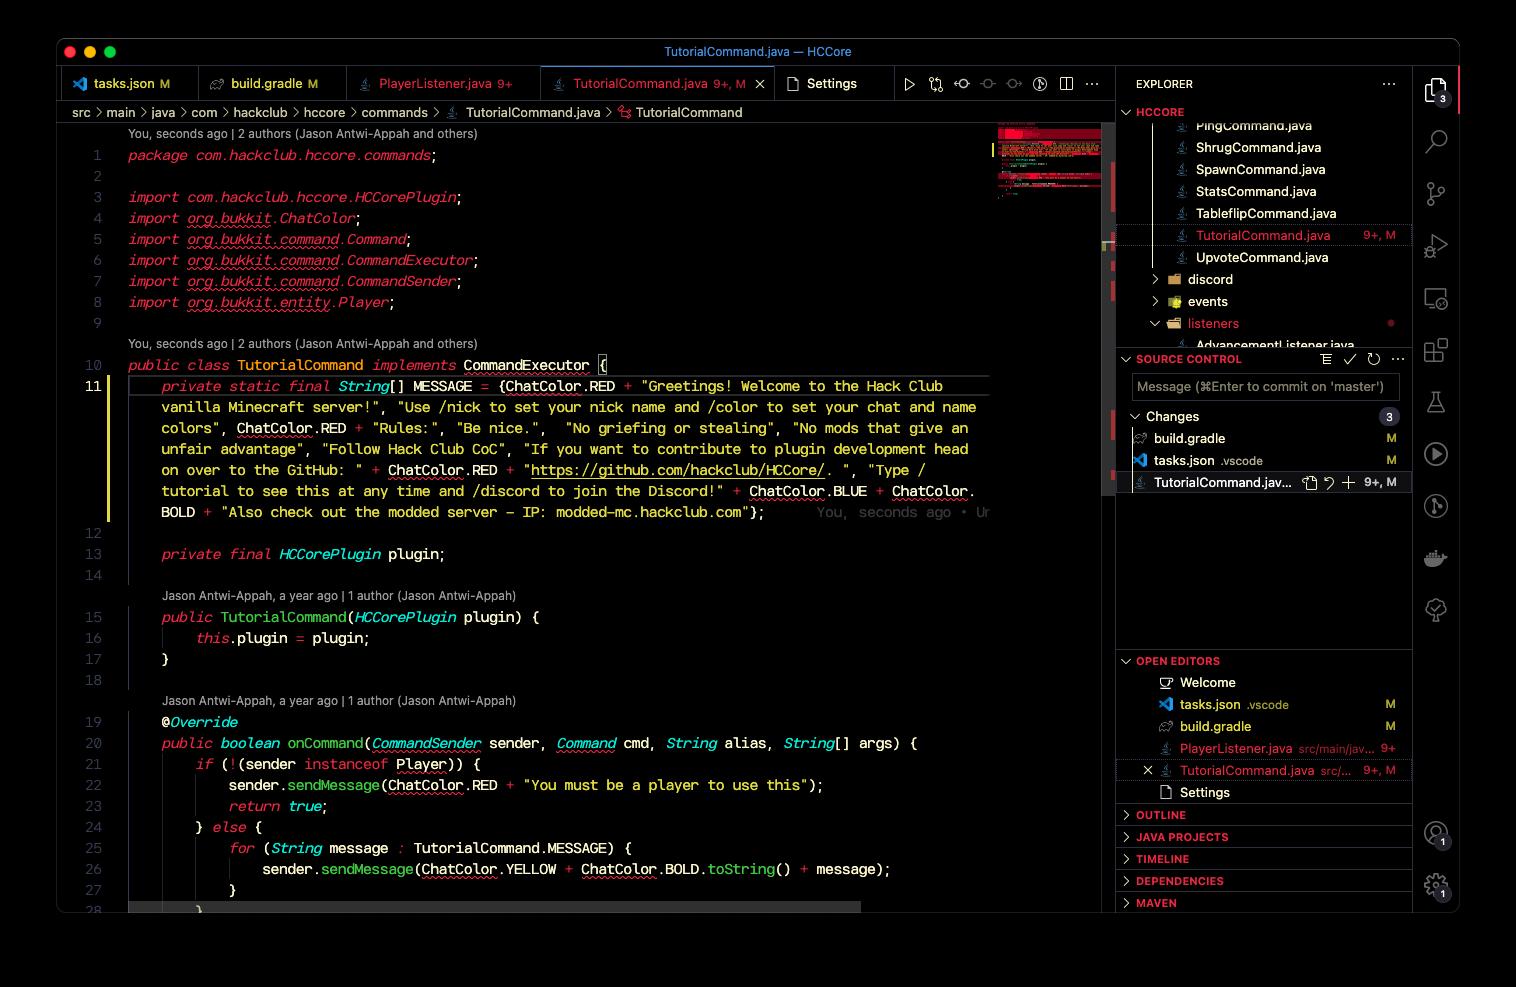 https://cloud-iajsv3vc7-hack-club-bot.vercel.app/0image.png